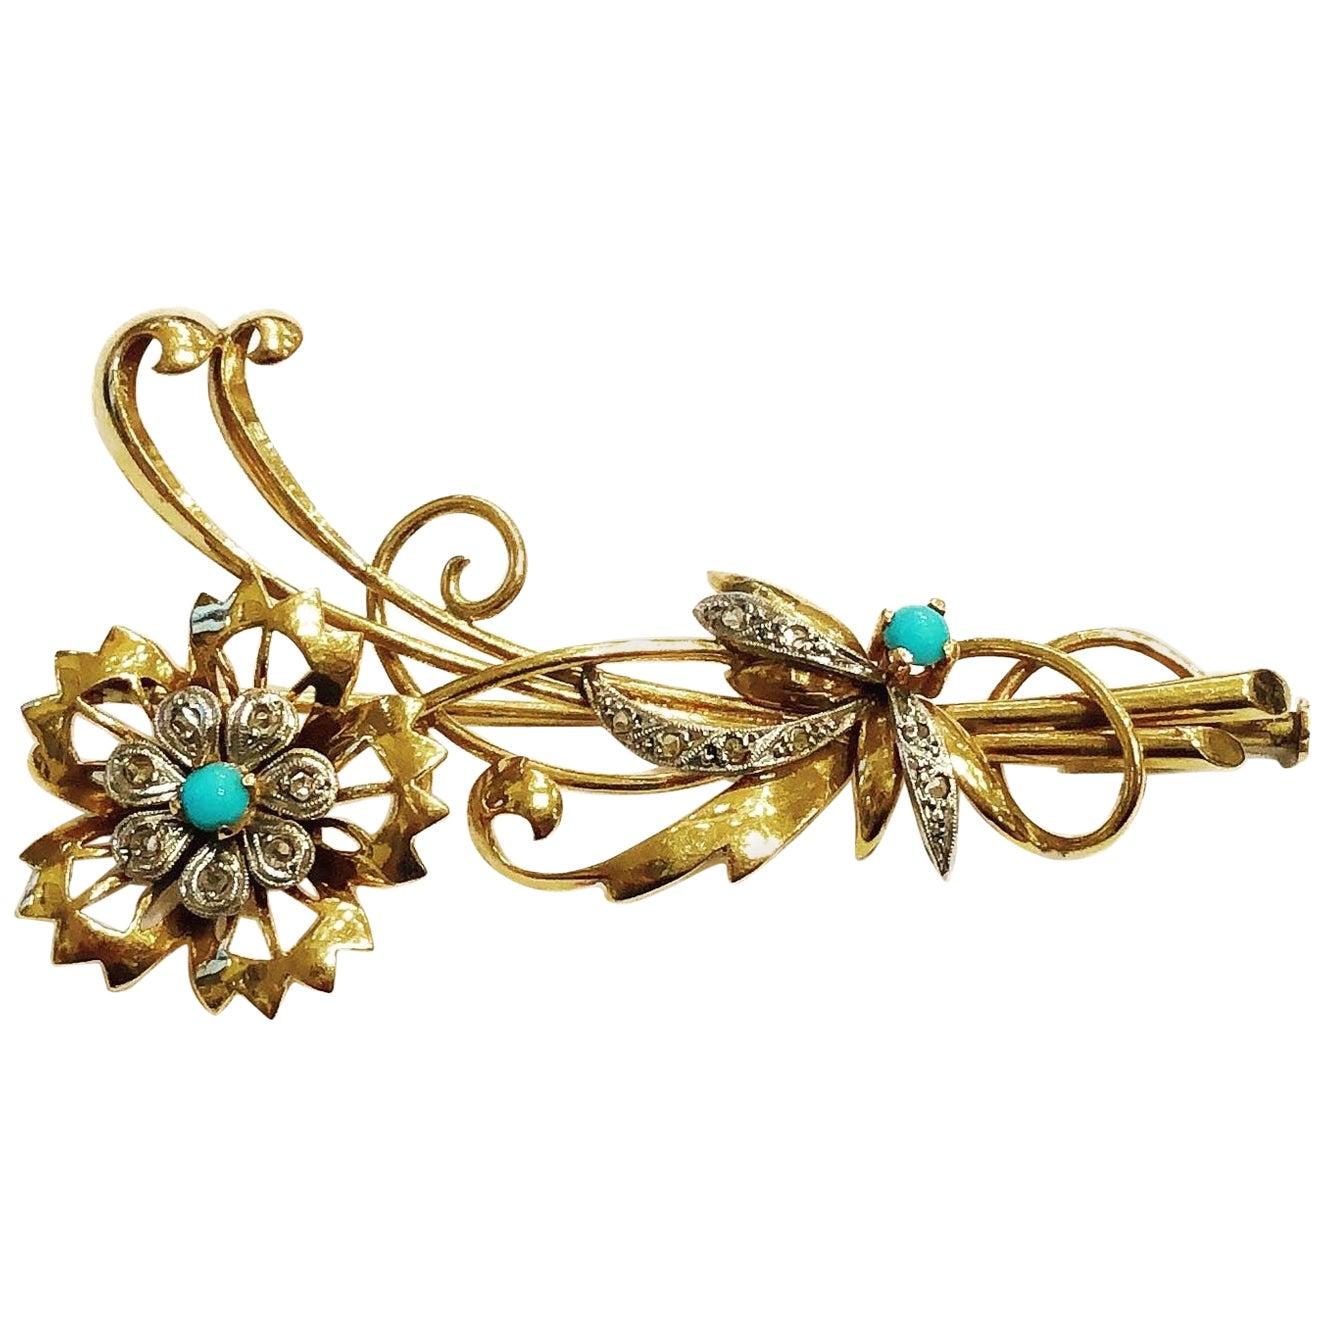 1940s Retro Platinum, Yellow Gold, Diamonds, Turquoise Flowers Bouquet Brooch